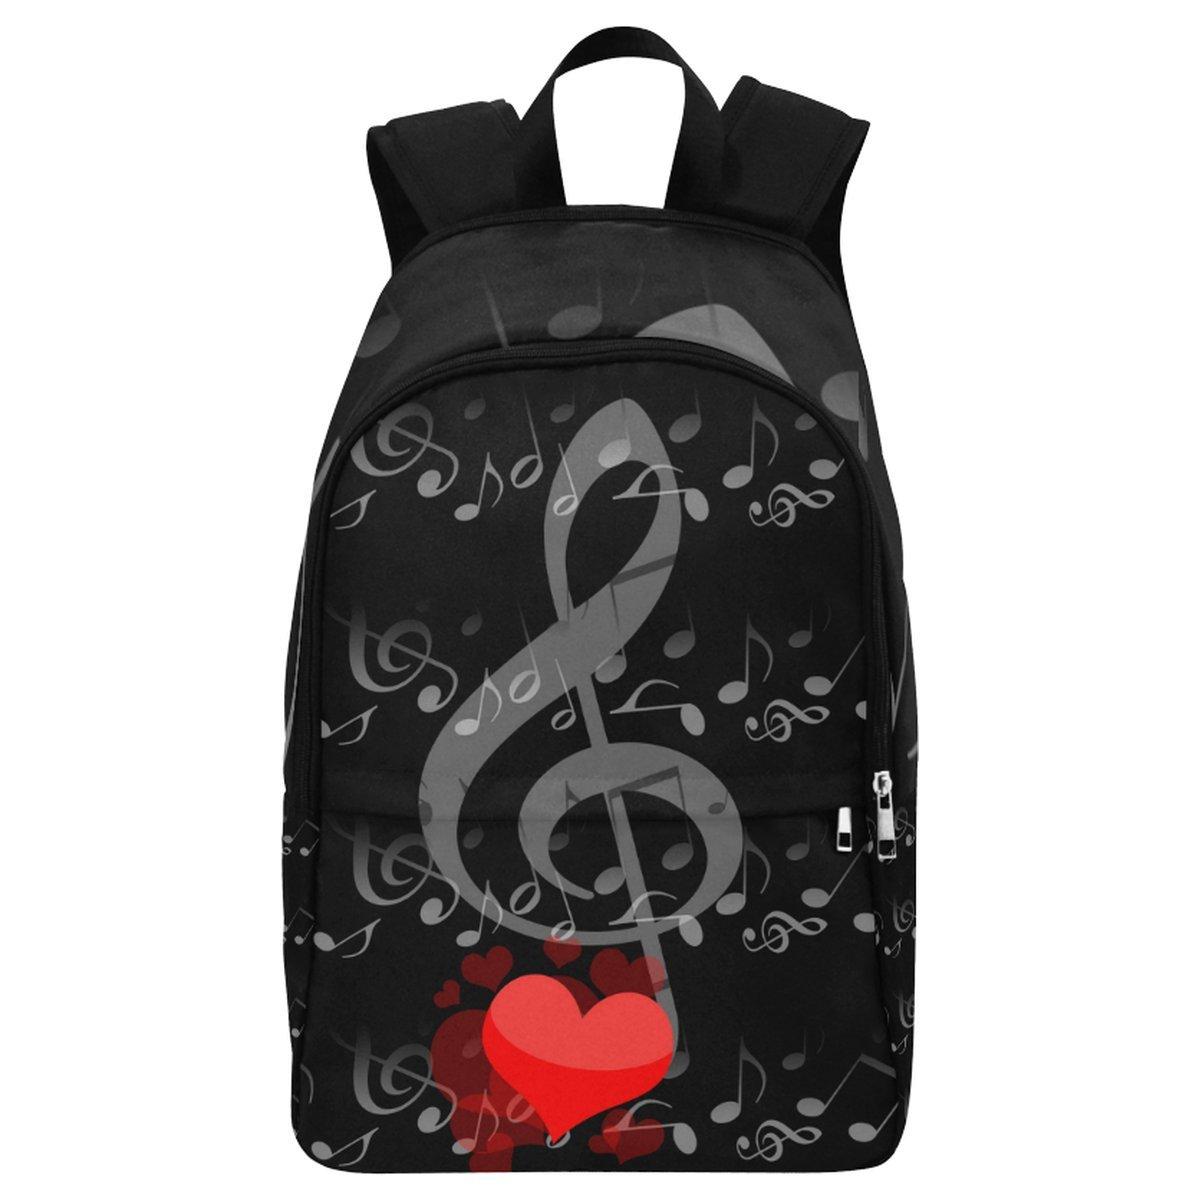 InterestPrint Custom Music Note Love Heart Casual Backpack School Bag Travel Daypack